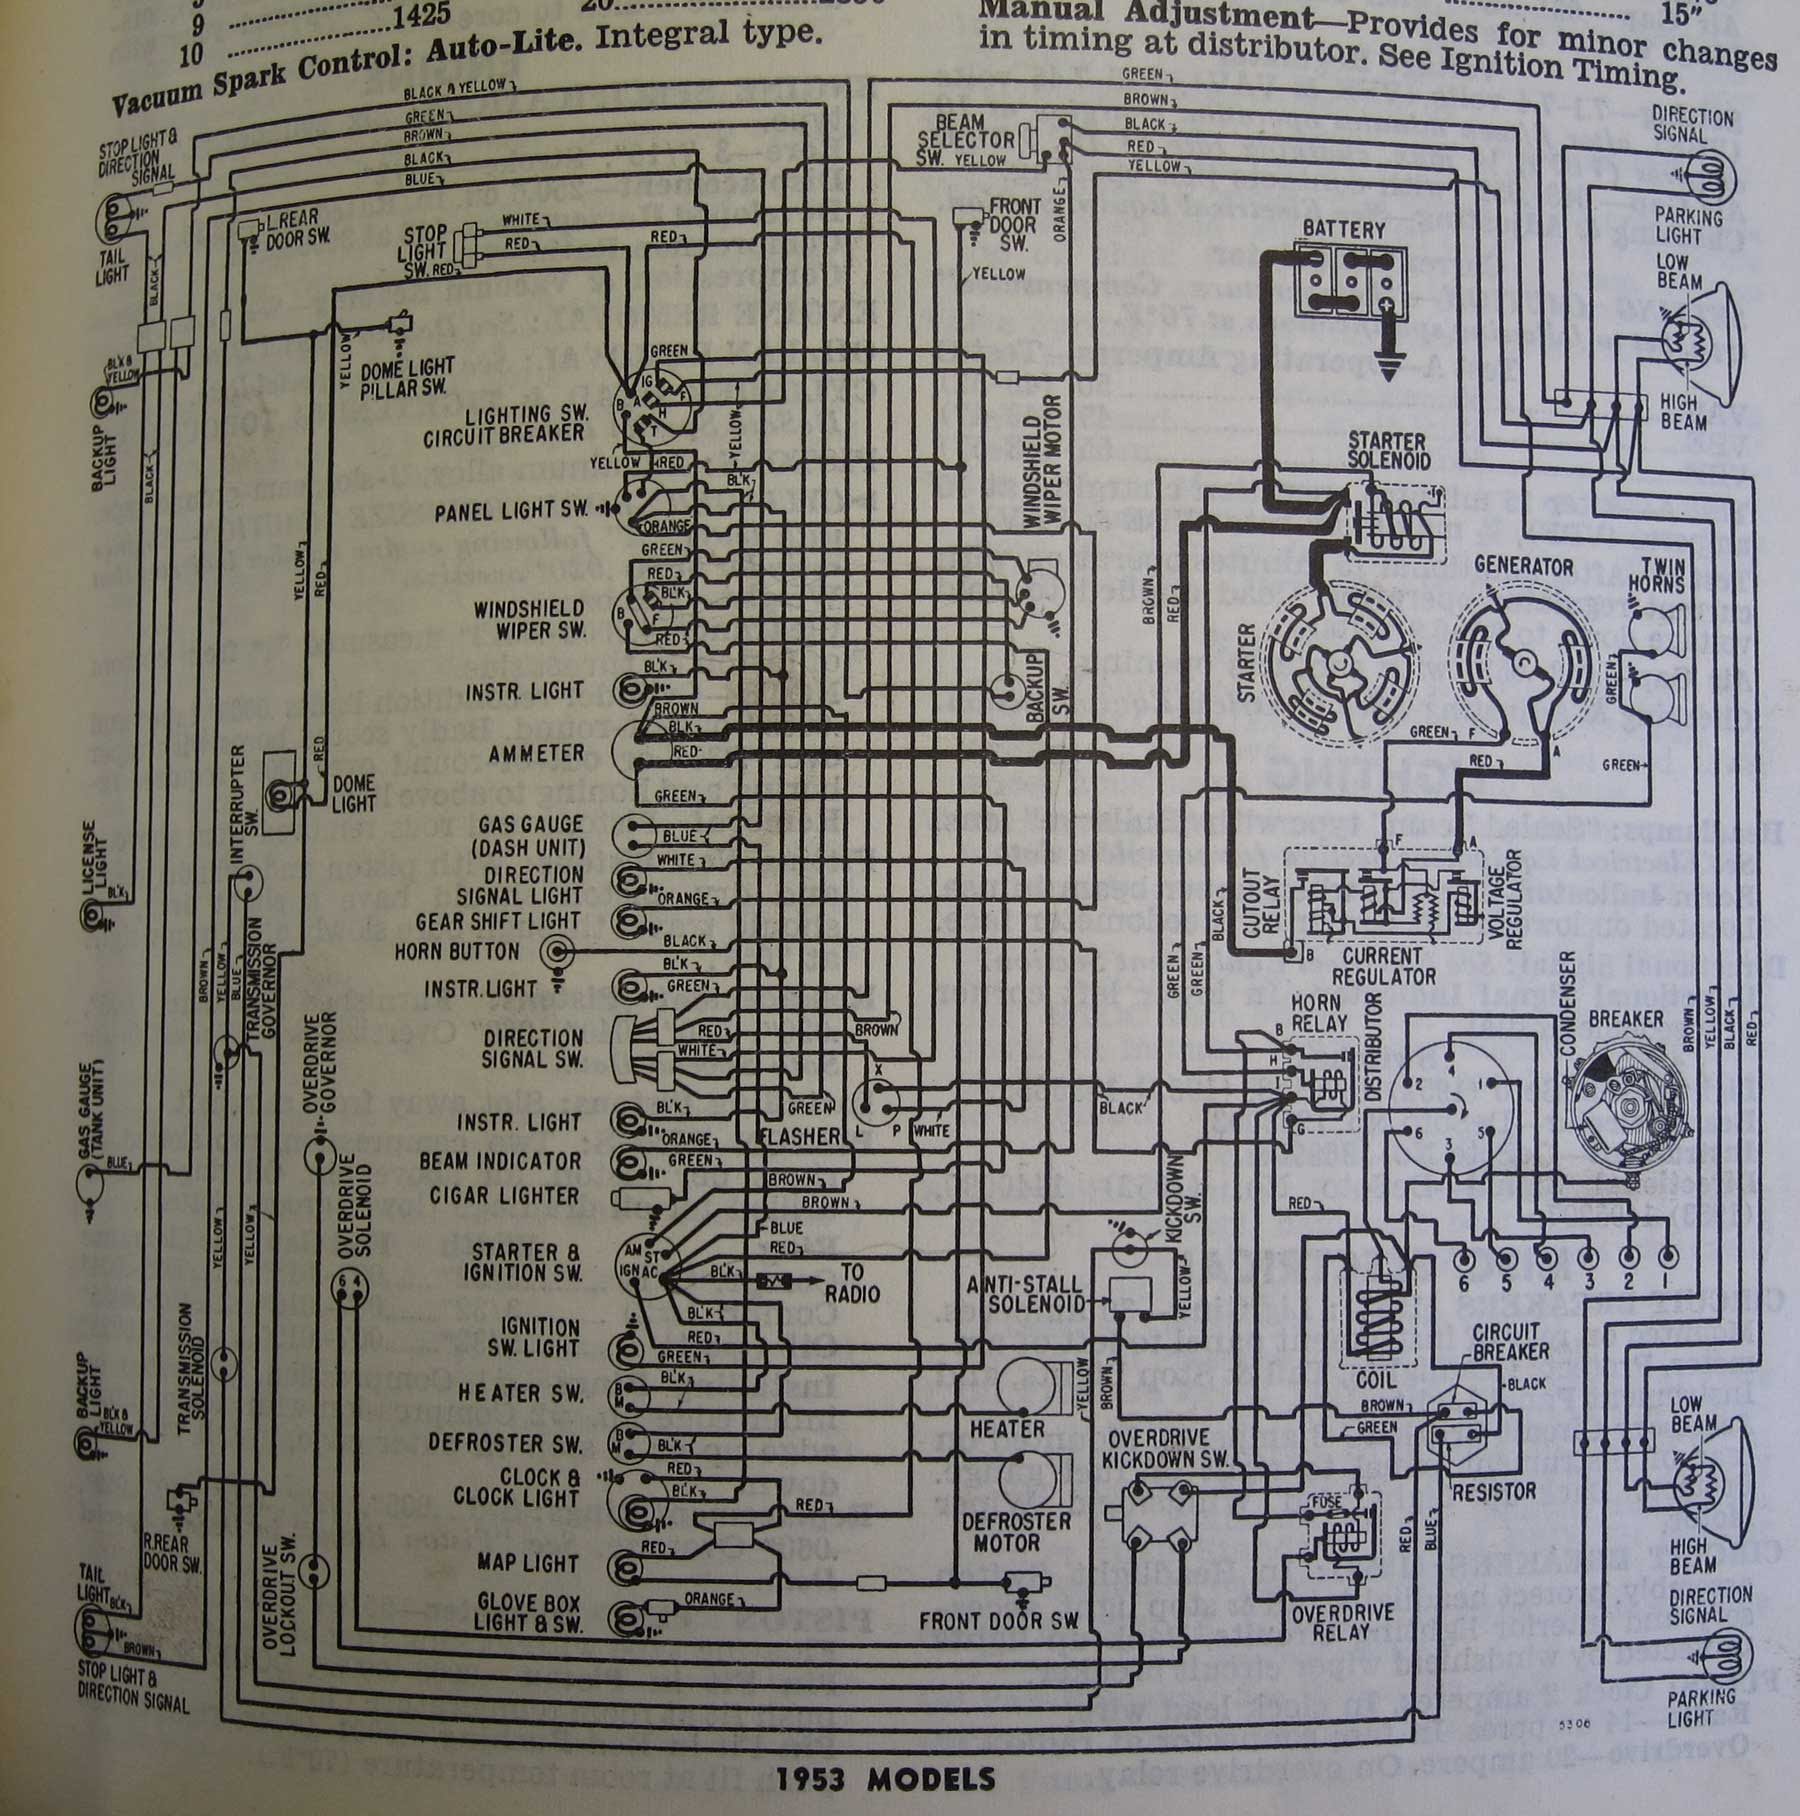 Diagram 1959 Desoto Wiring Diagram Full Version Hd Quality Wiring Diagram Badhomewiringk Mormilearredamenti It